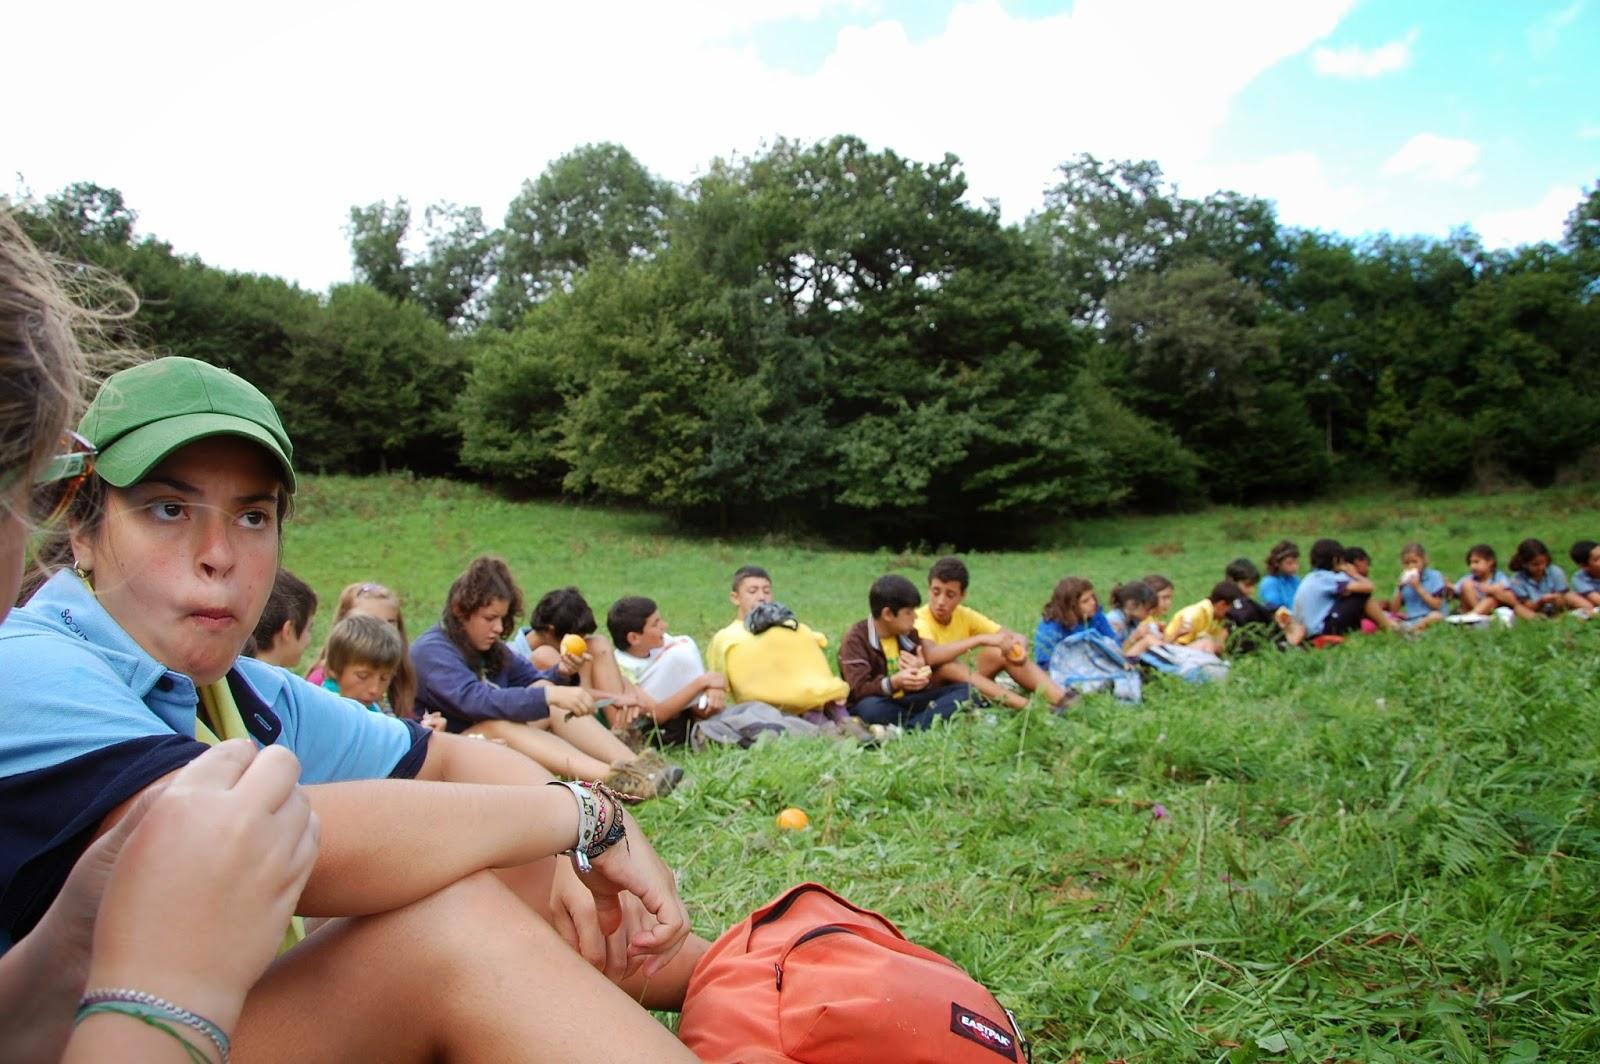 Campaments Estiu RolandKing 2011 - DSC_0061%2B2.JPG